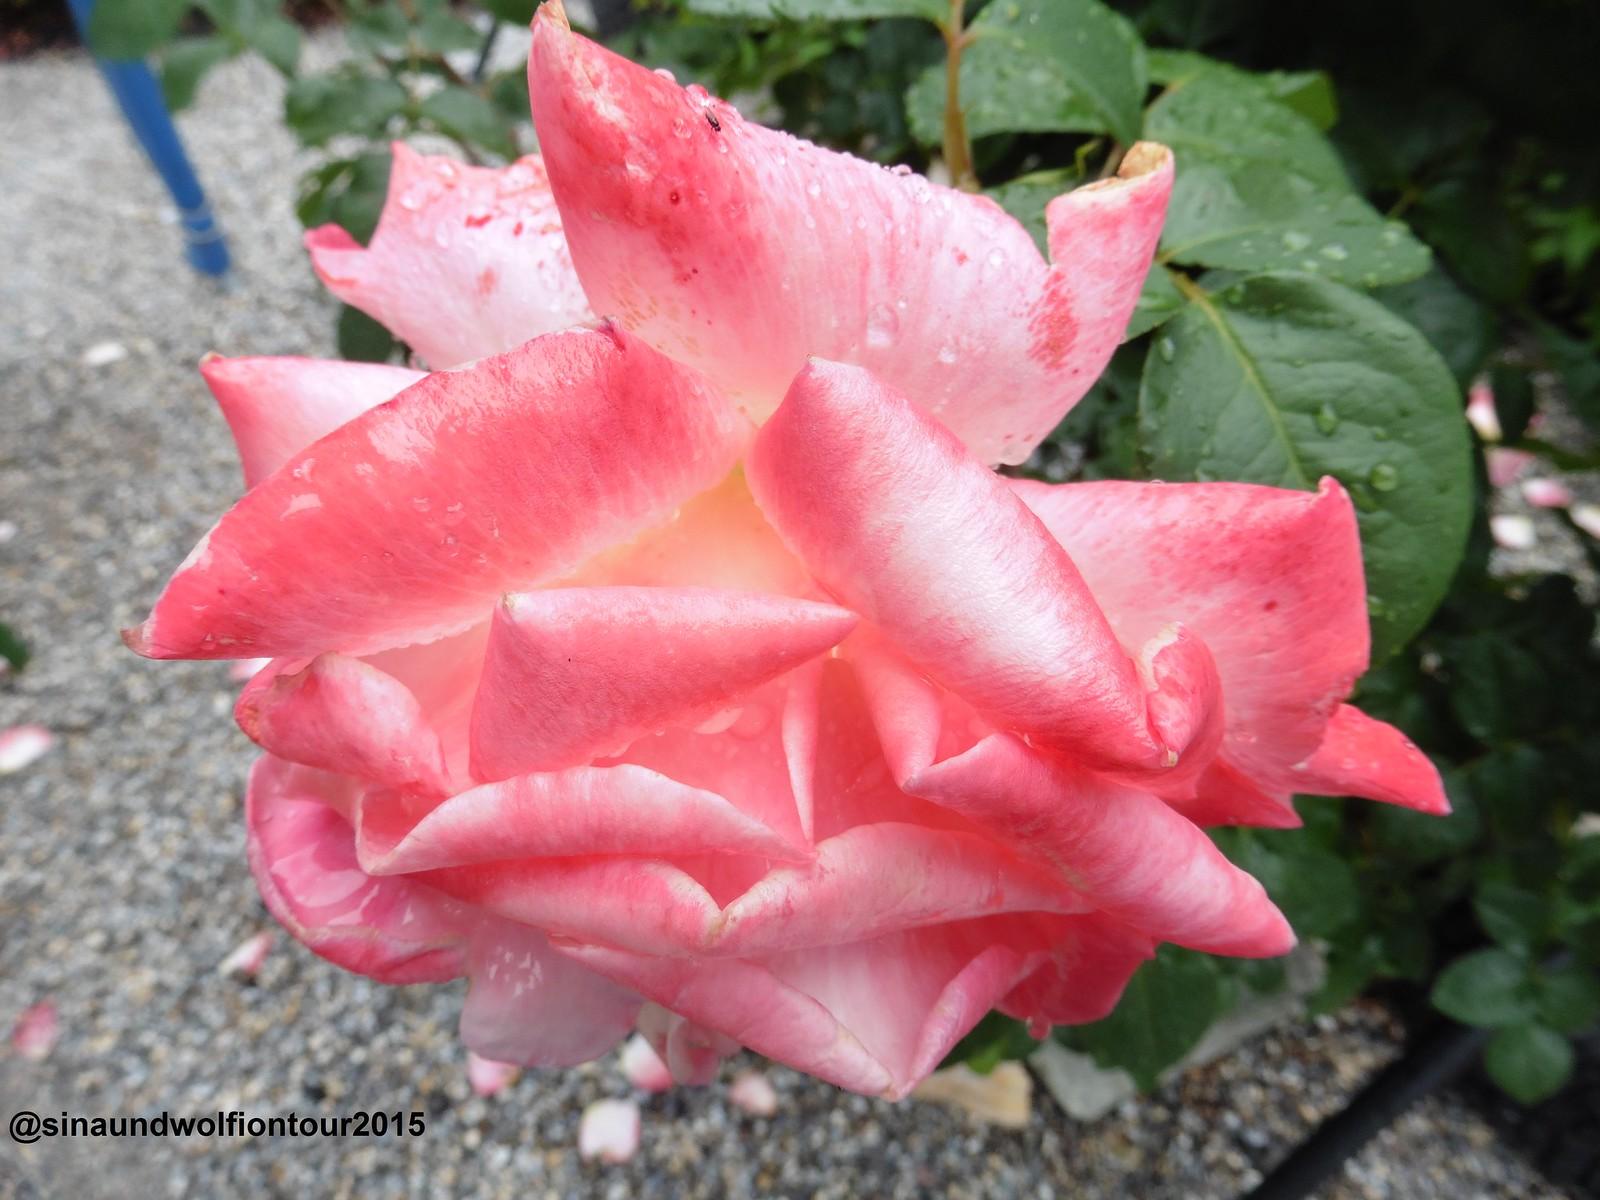 Rose, Wachau